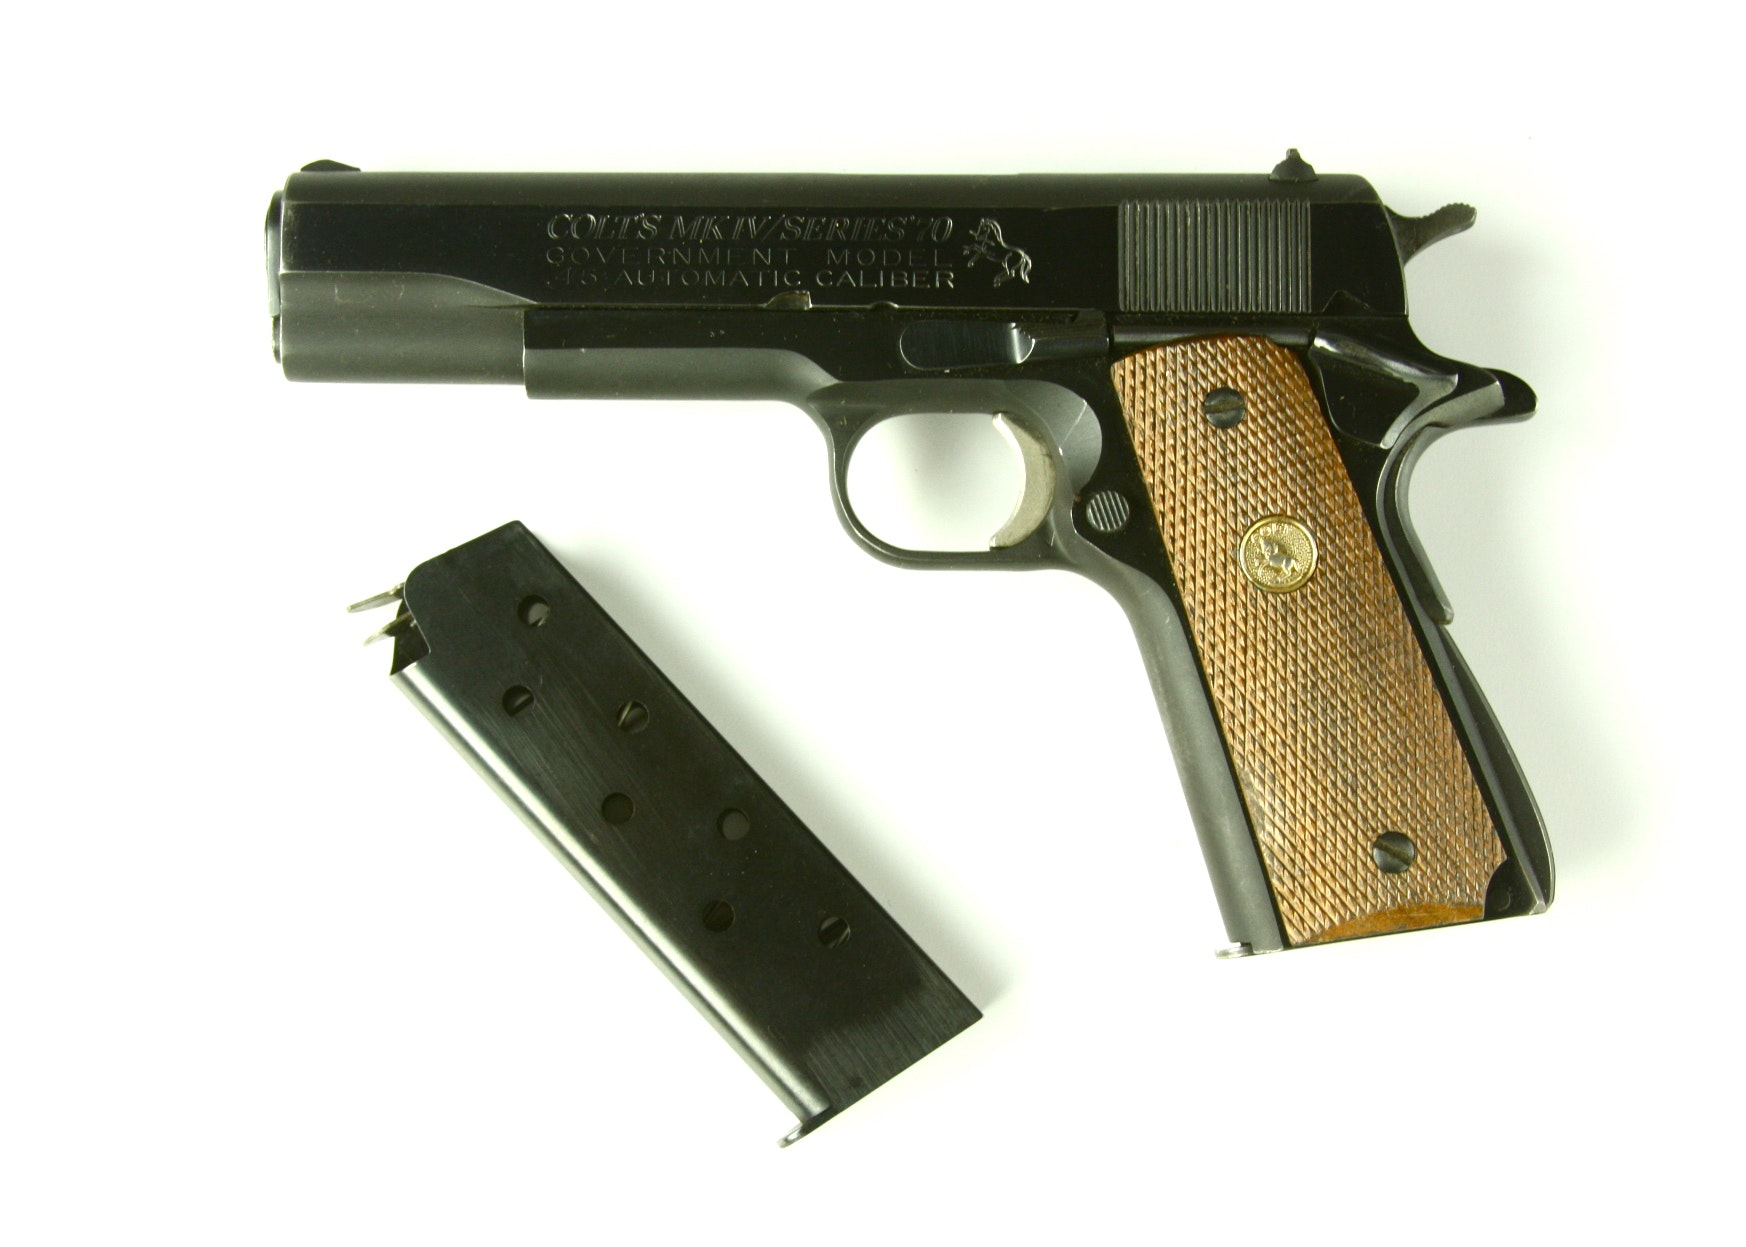 Colt 45 MK IV Series 70 pistol